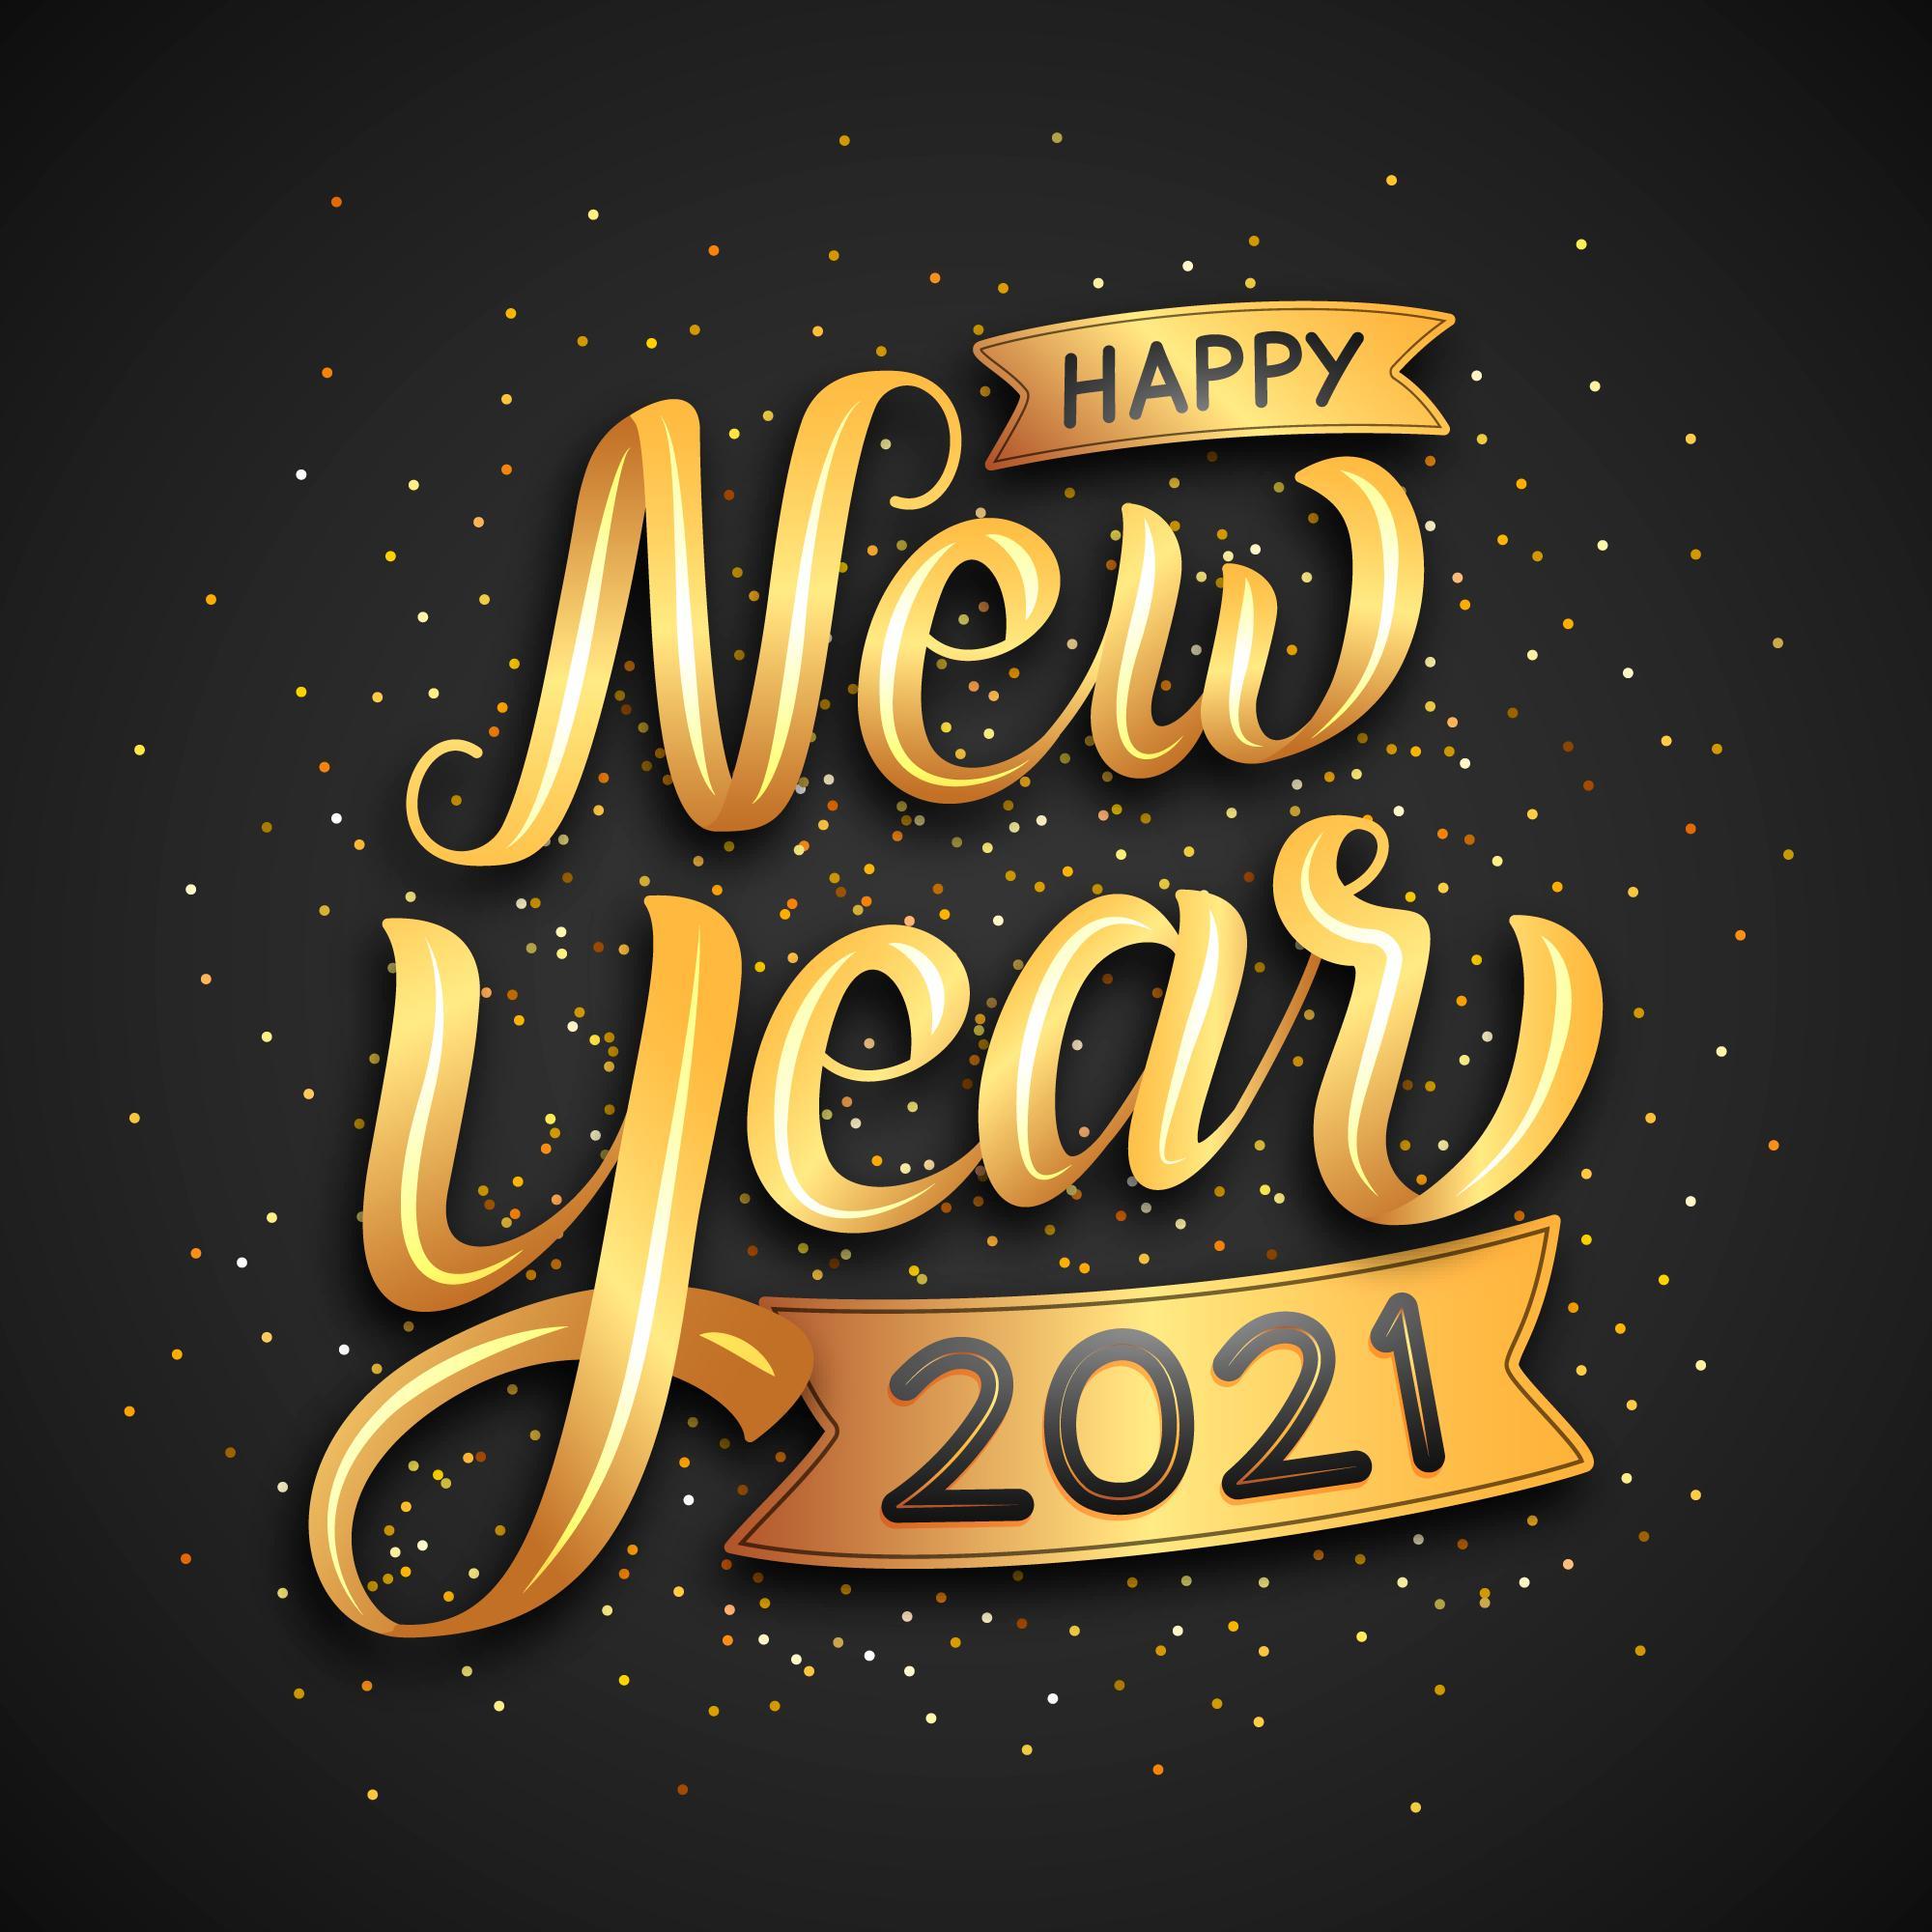 Apa Hukum Mengucapkan Selamat Tahun Baru???